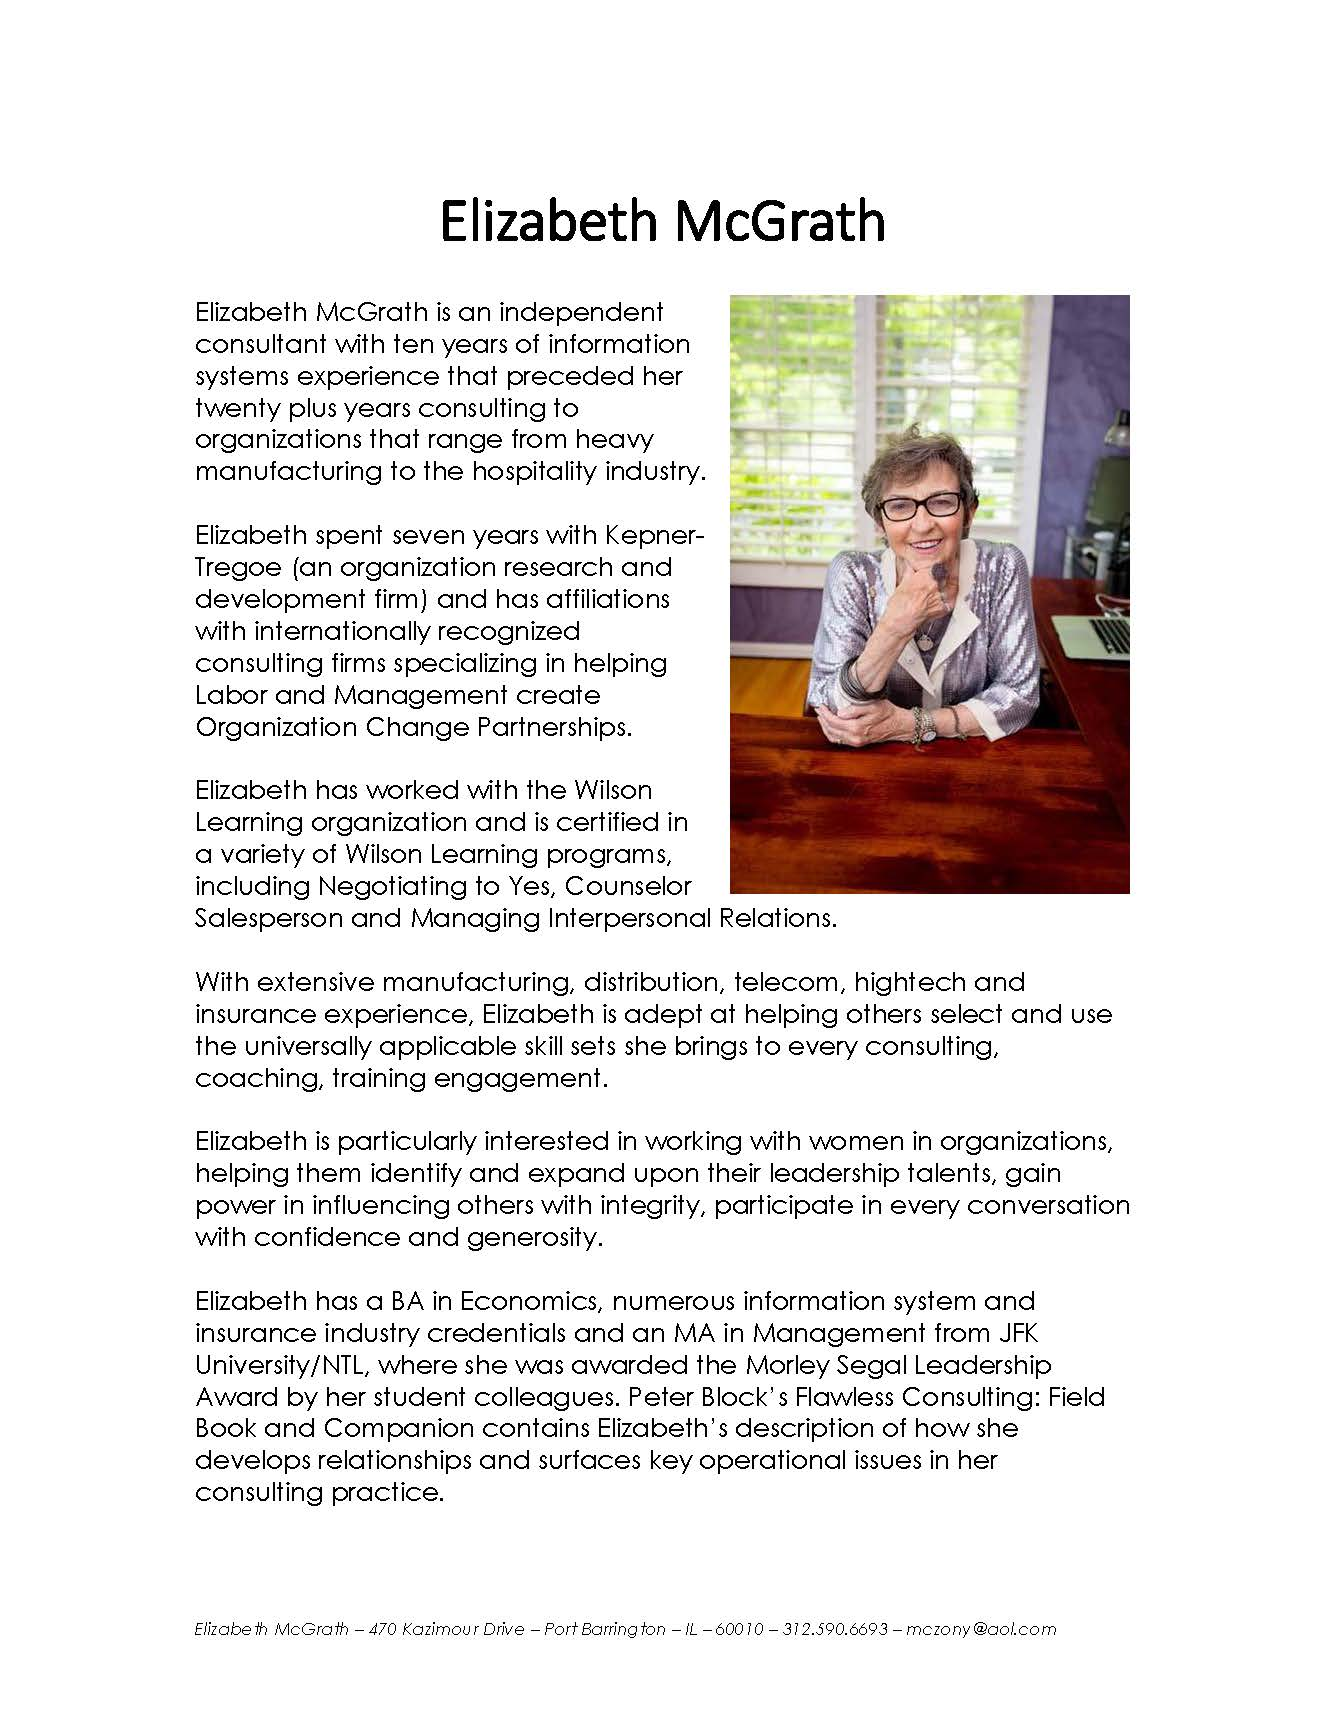 Elizabeth McGrath - Woman Speaker - Biography